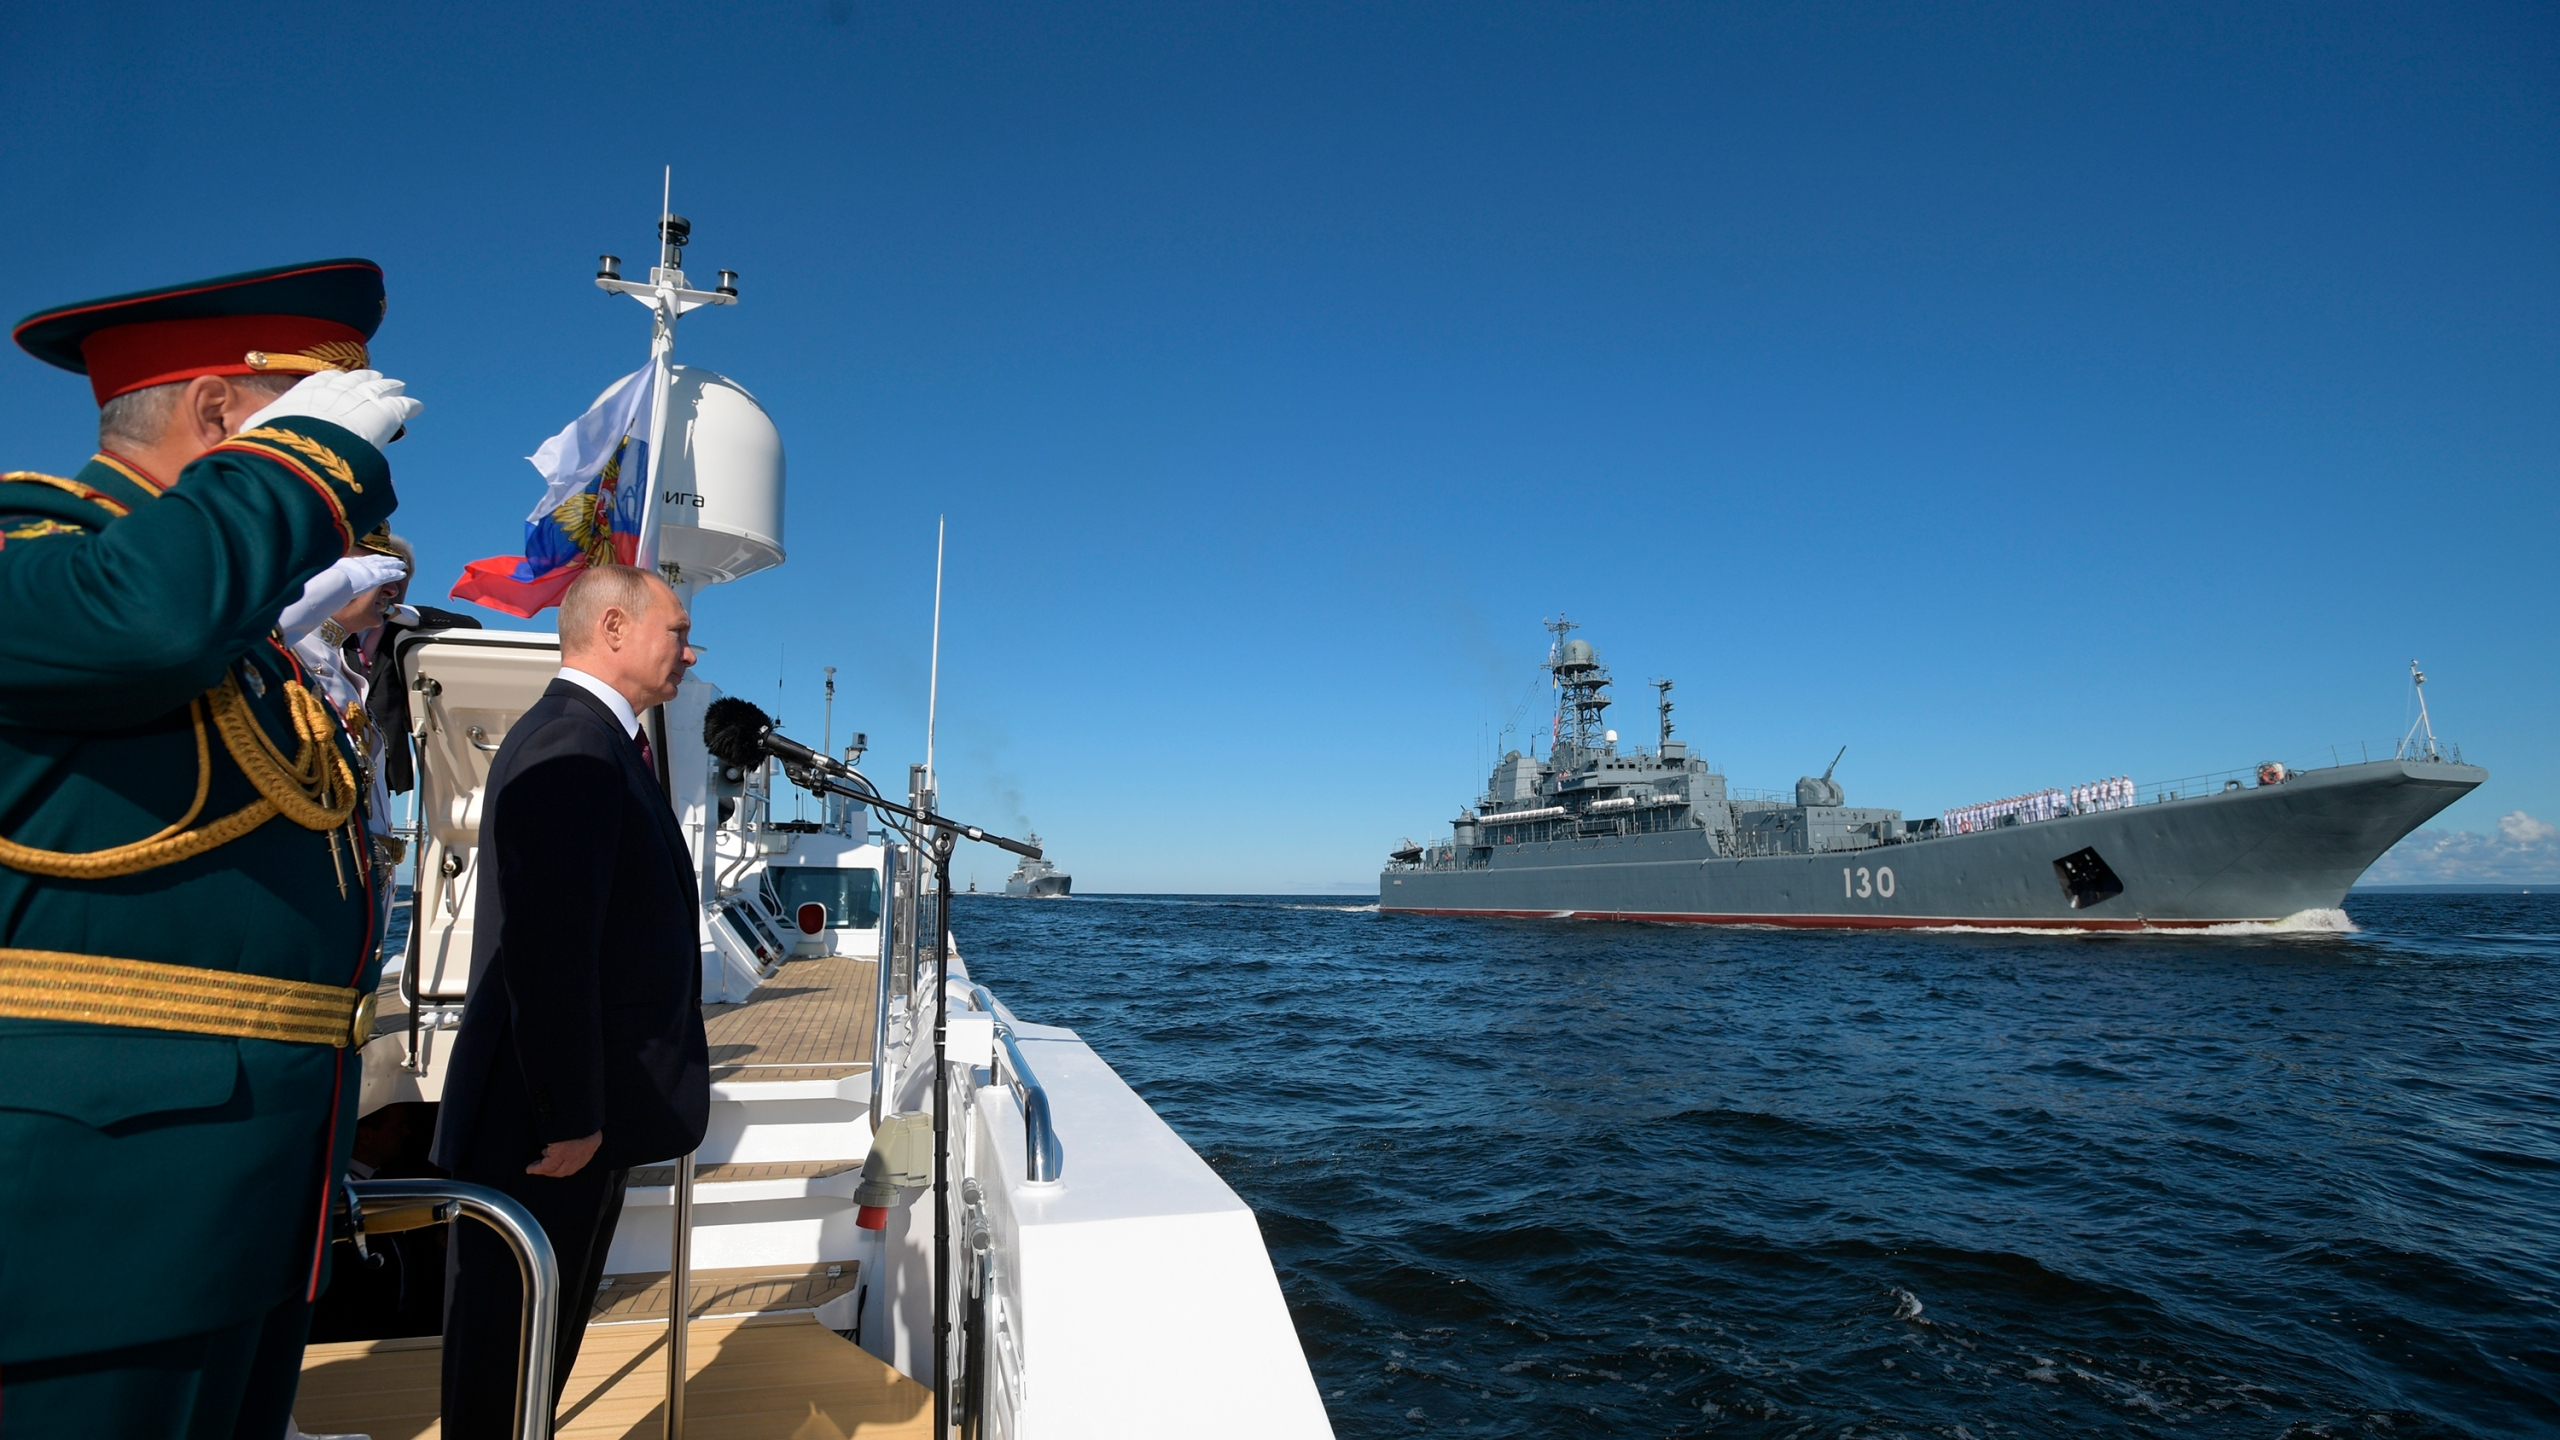 Alaska Christmas Parade 2020 Russian navy conducts major maneuvers near Alaska